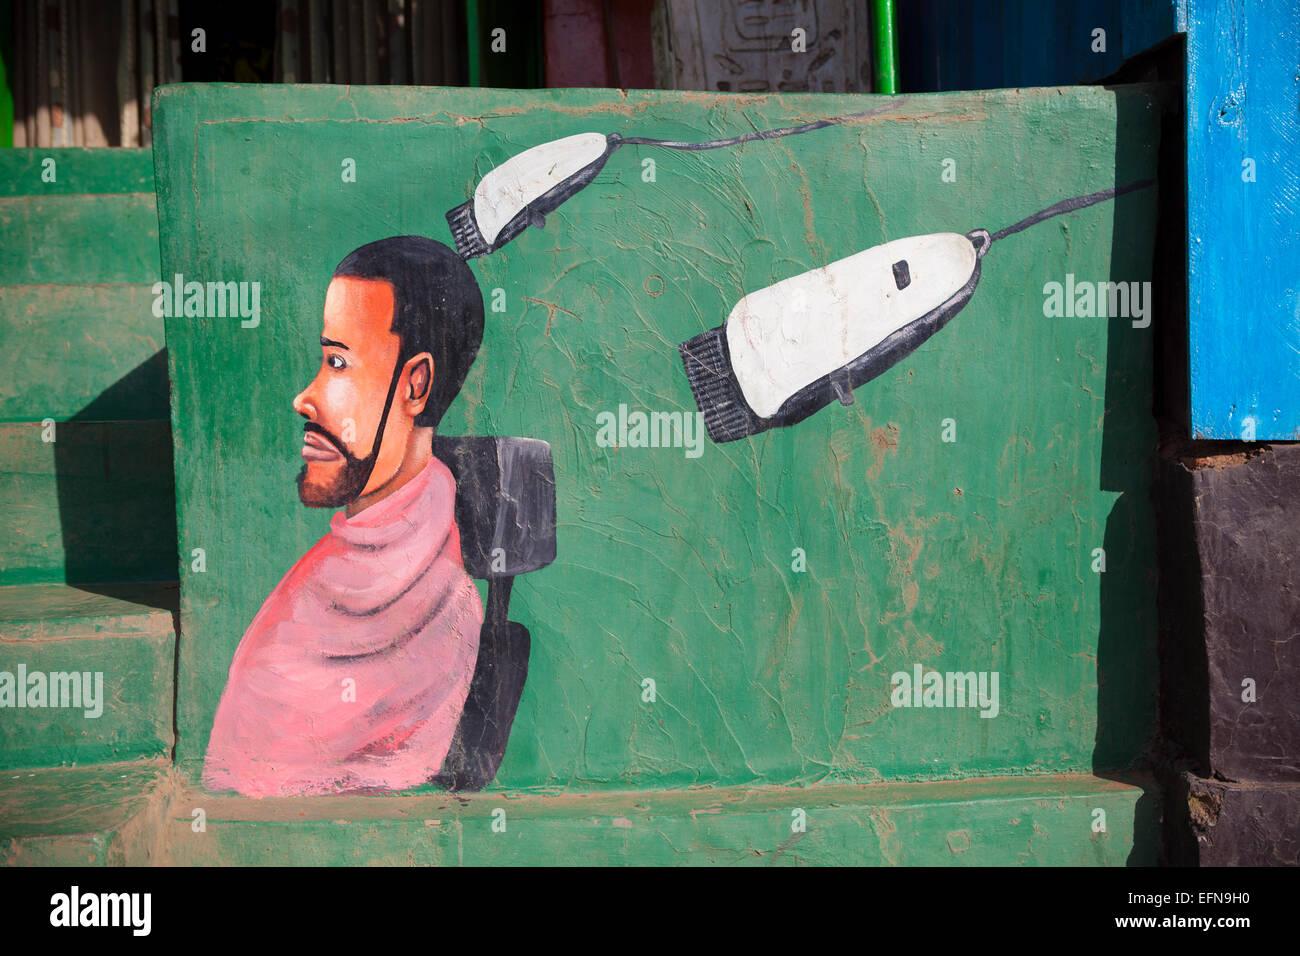 Mural outside barber shop, Kigali, Rwanda - Stock Image